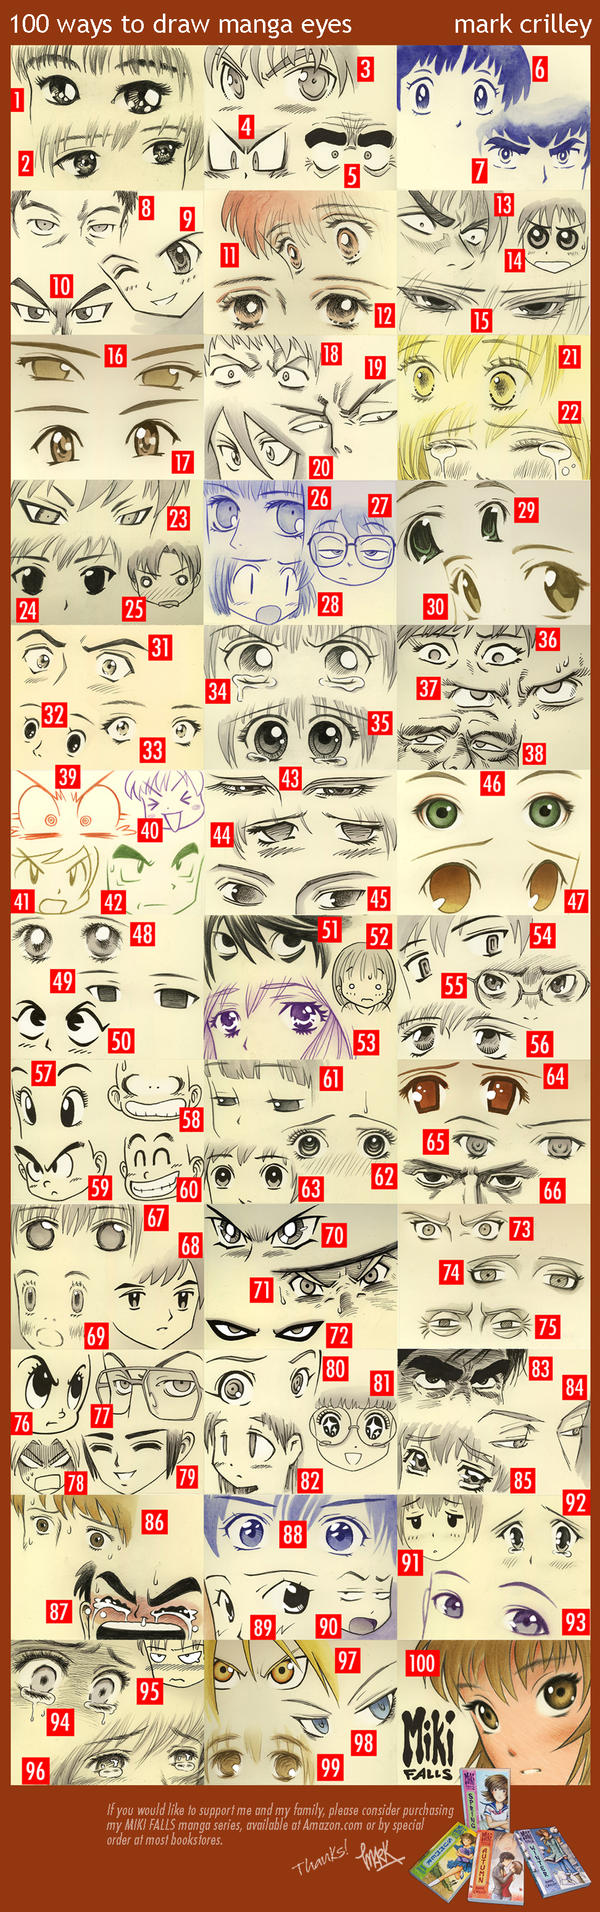 Manga Eyes, 100 Ways by markcrilley